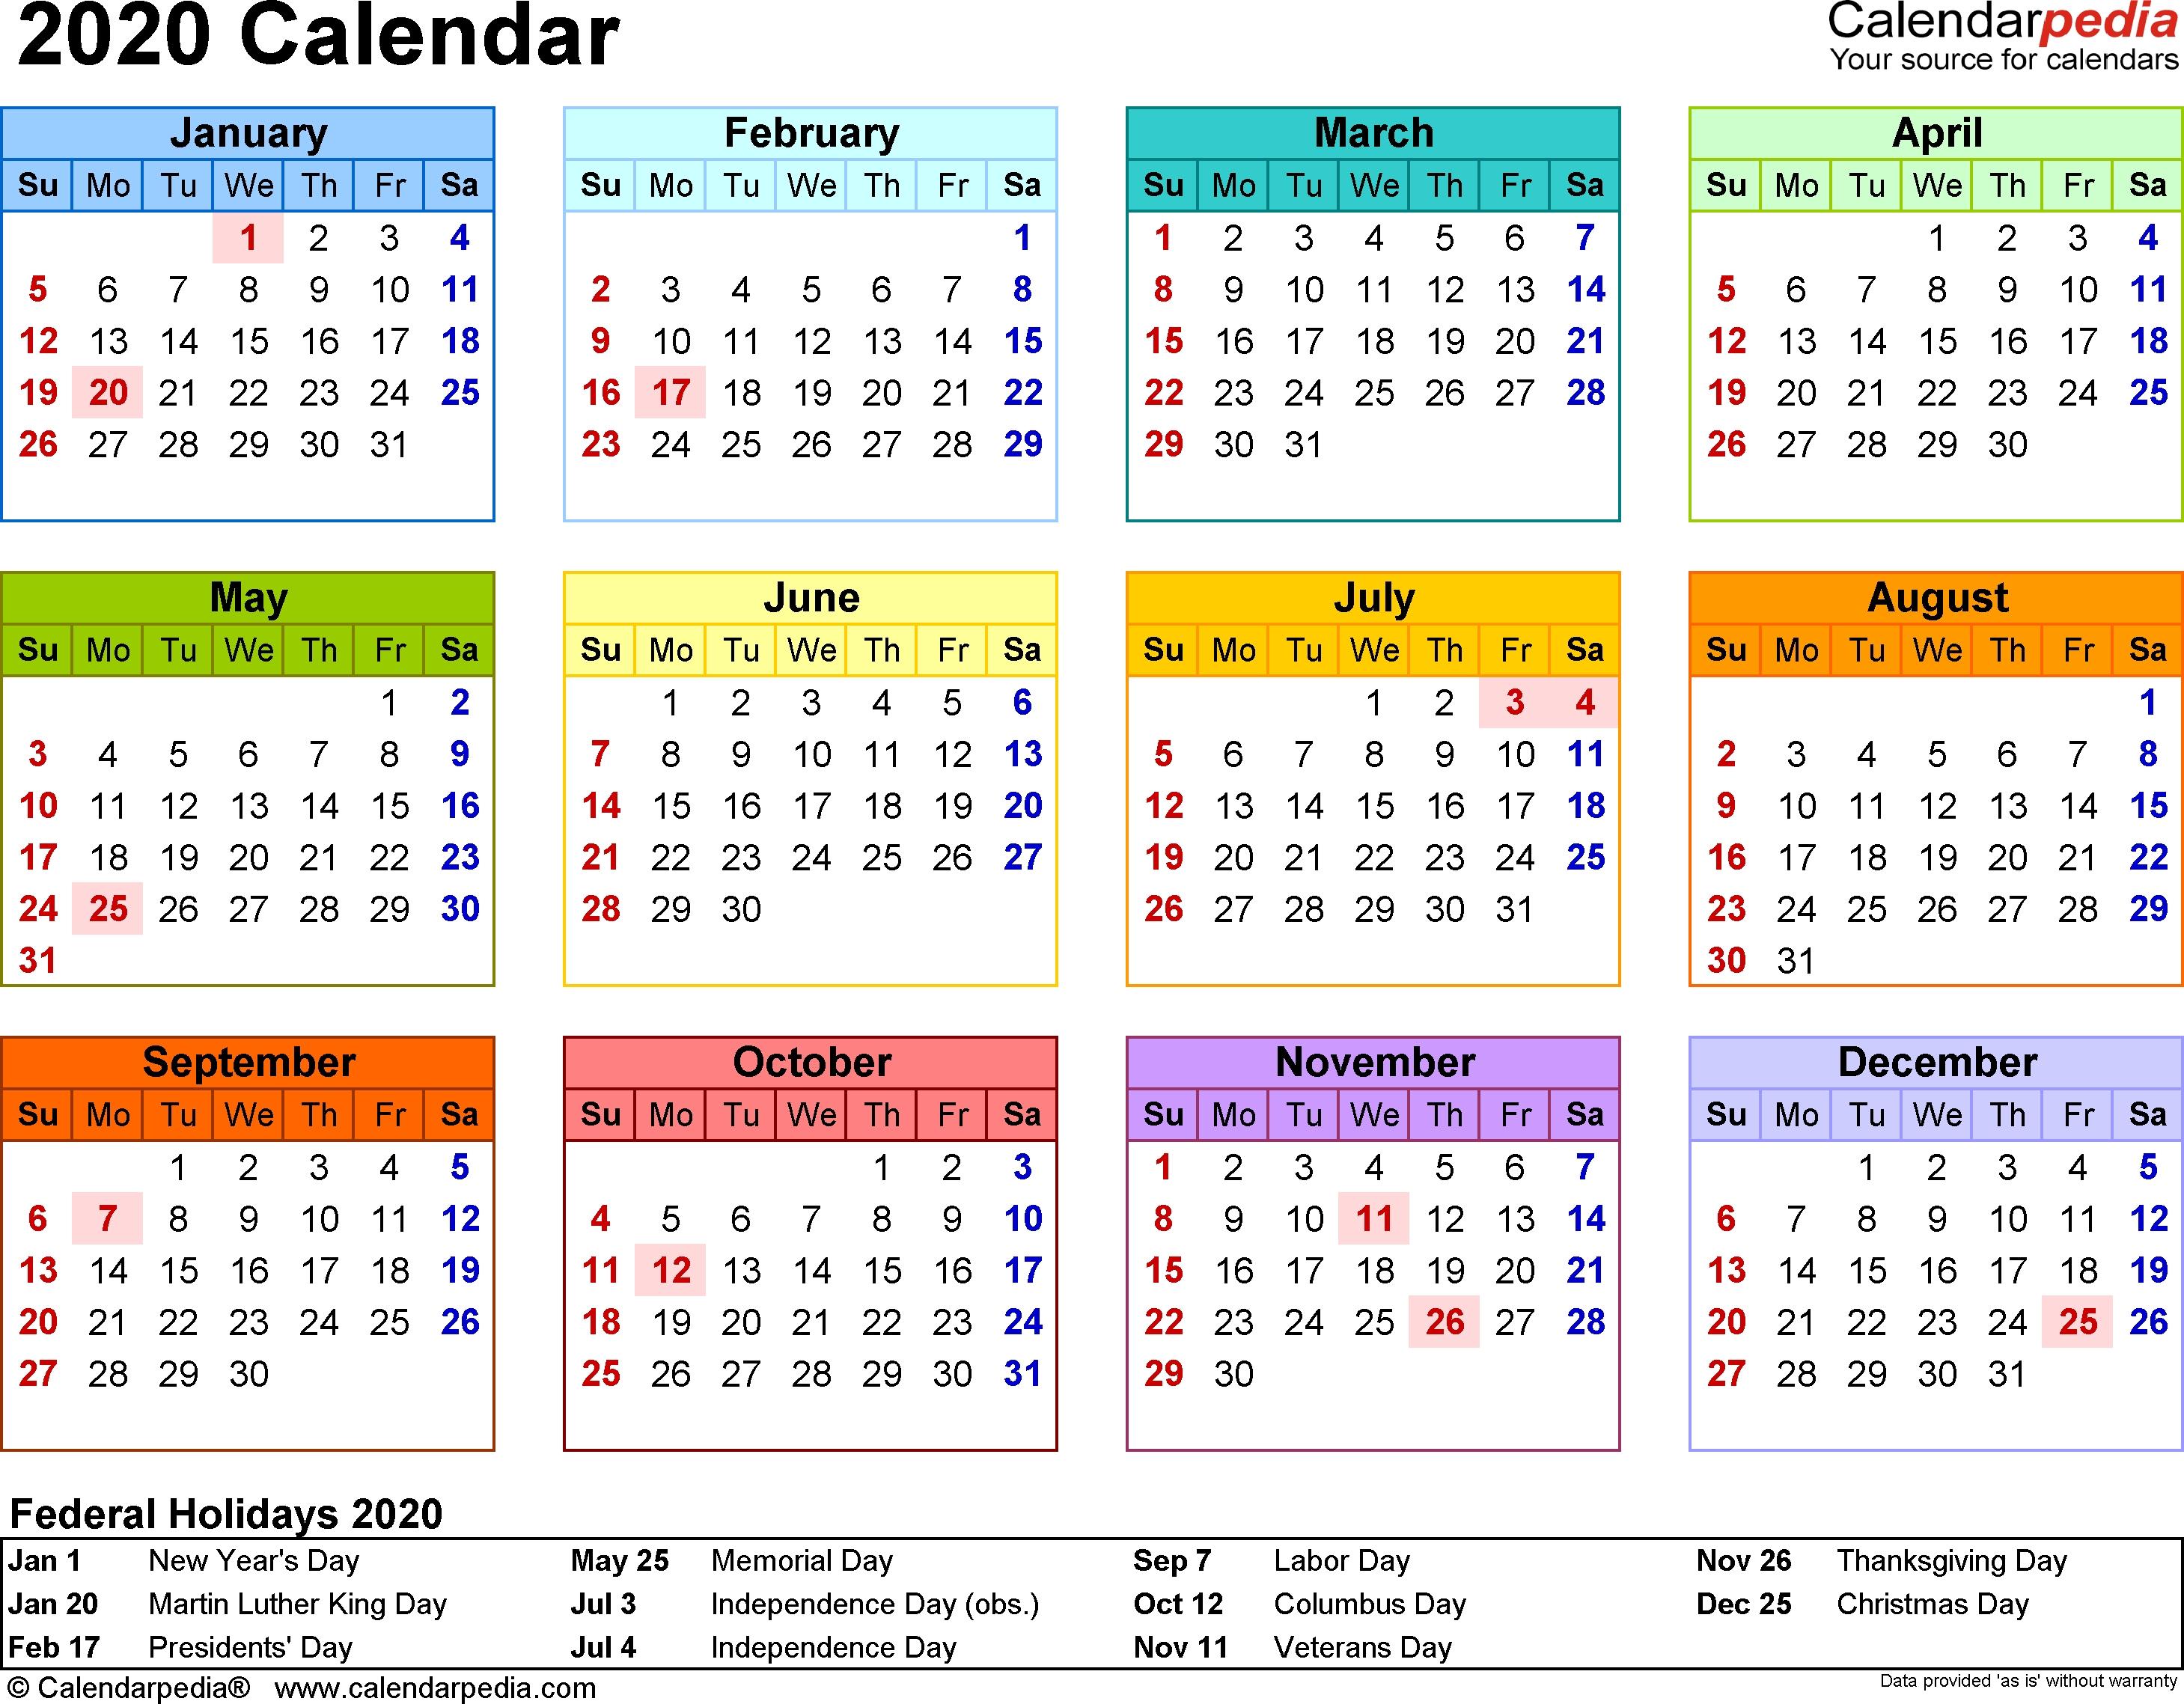 2020 Calendar - Download 18 Free Printable Excel Templates-January 2020 Calendar Singapore